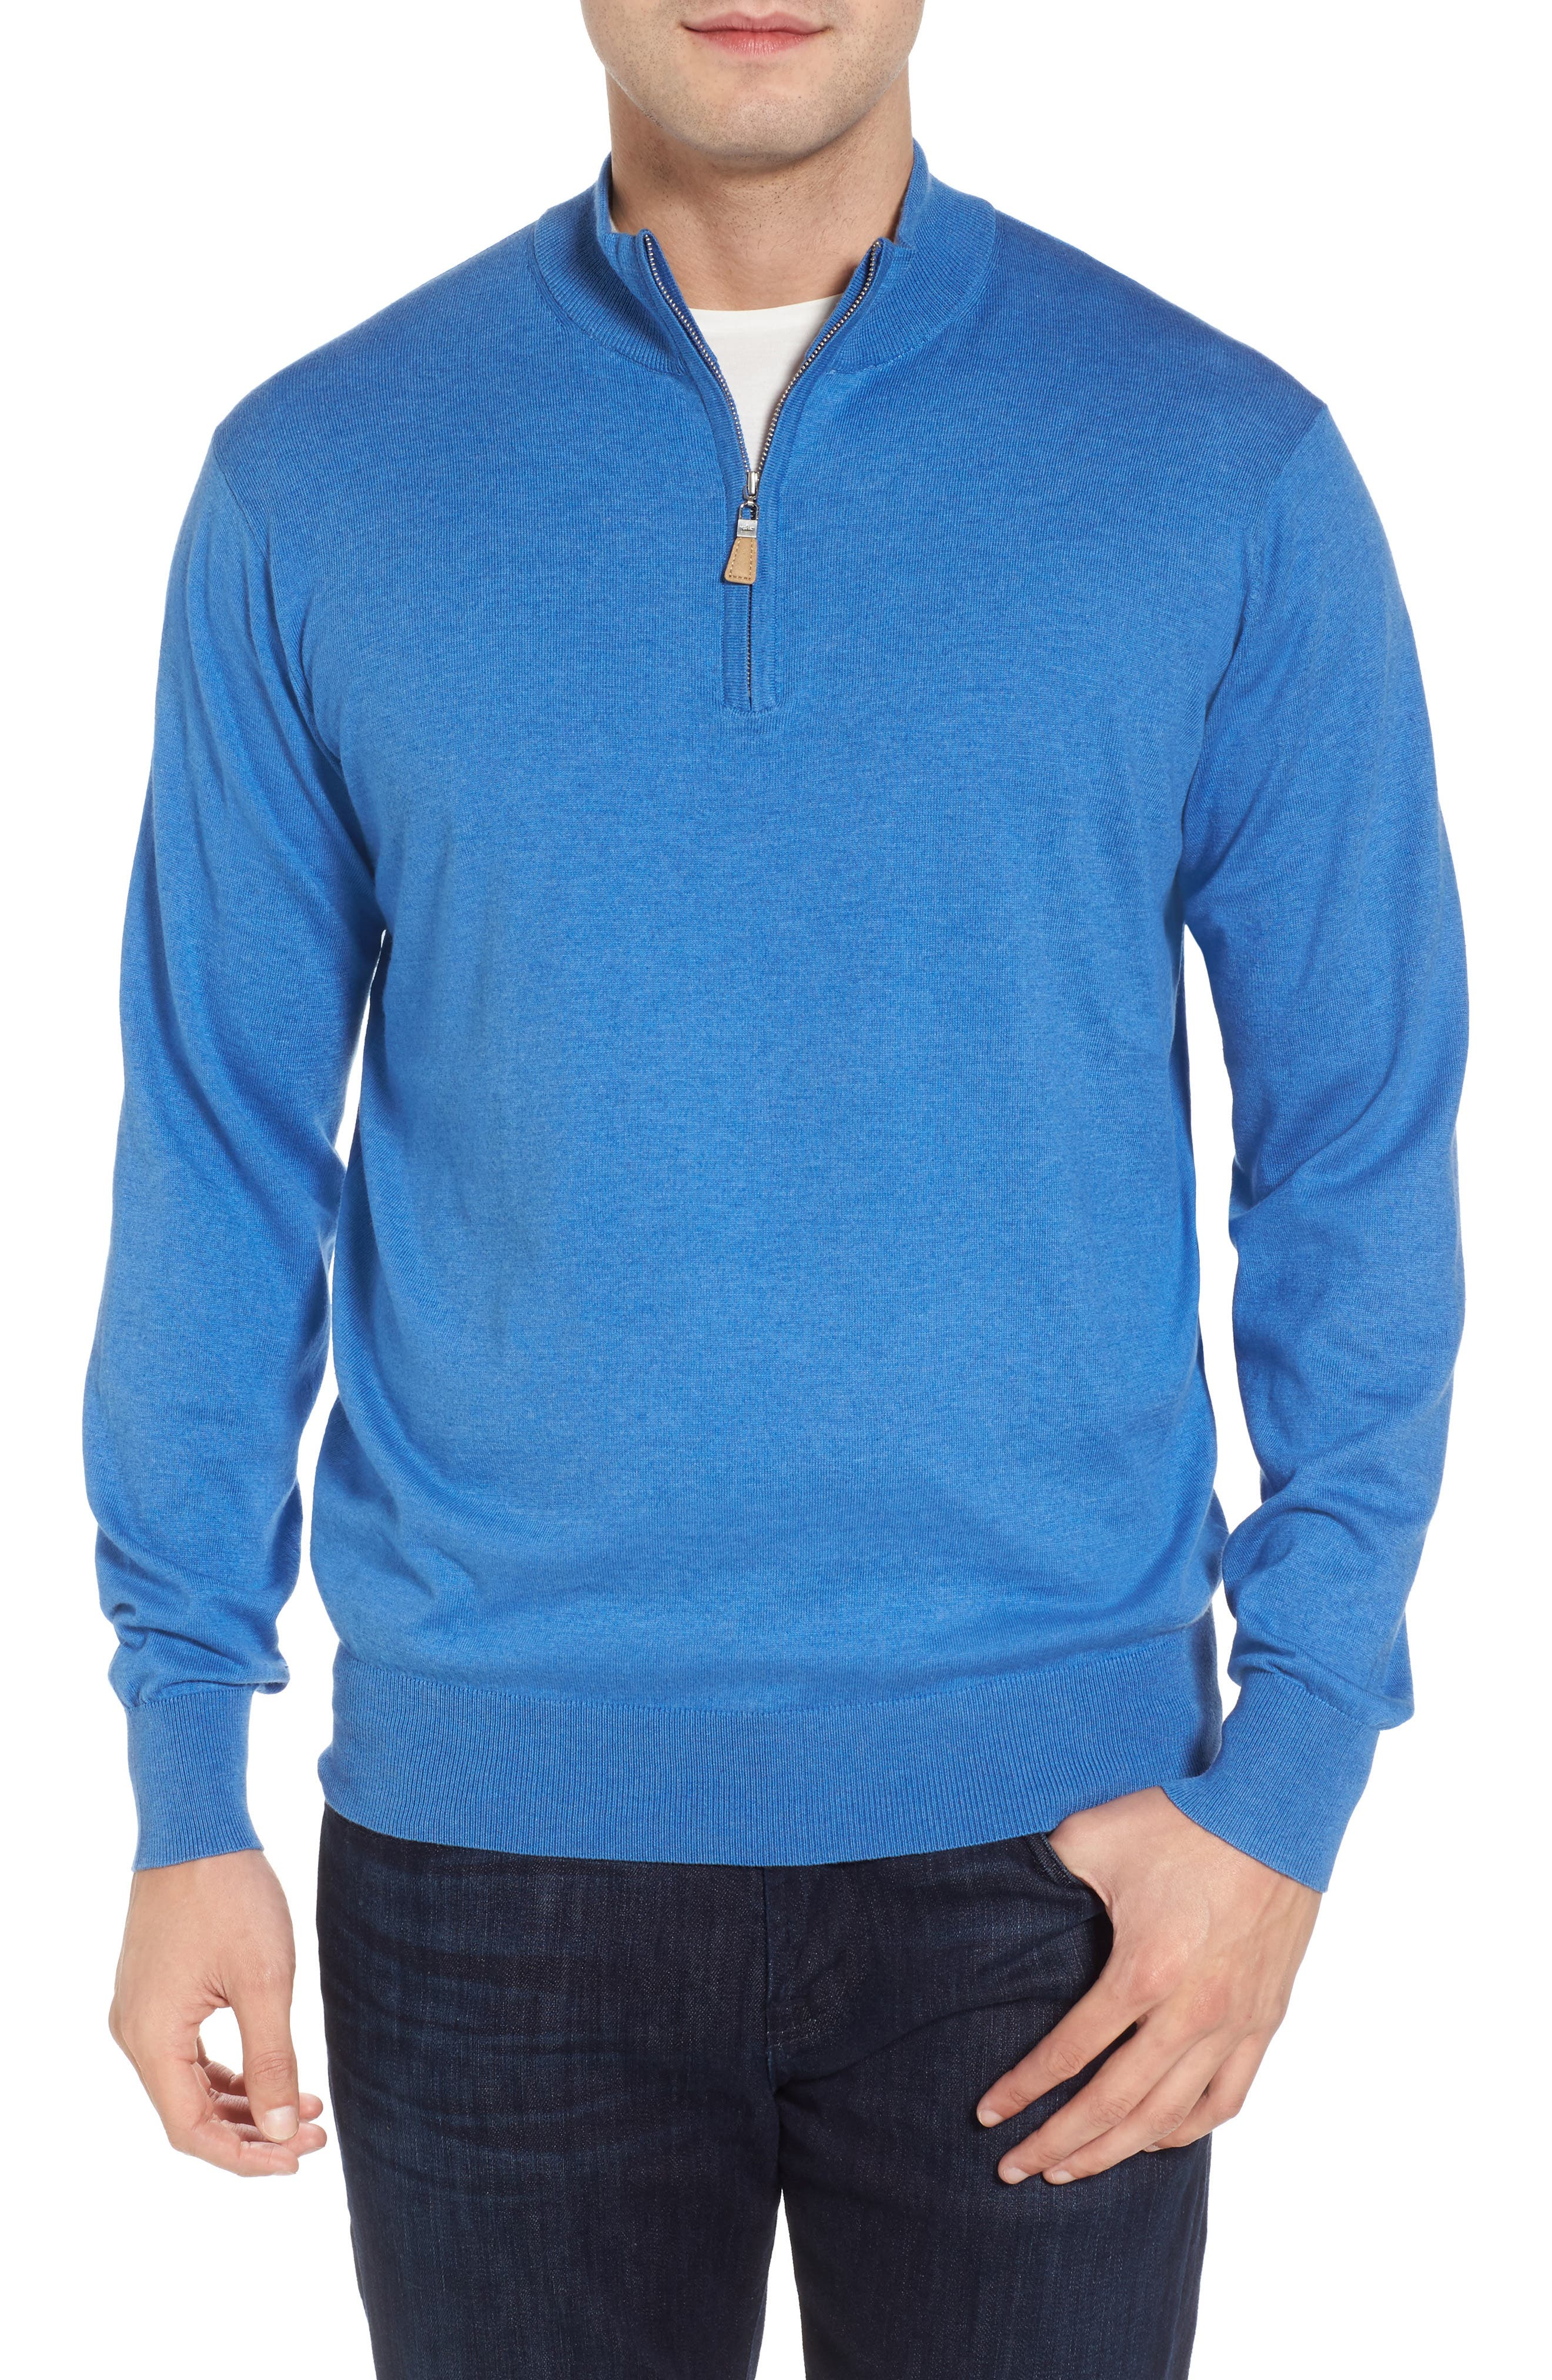 Crown Soft Quarter-Zip Pullover,                         Main,                         color, Boardwalk Blue